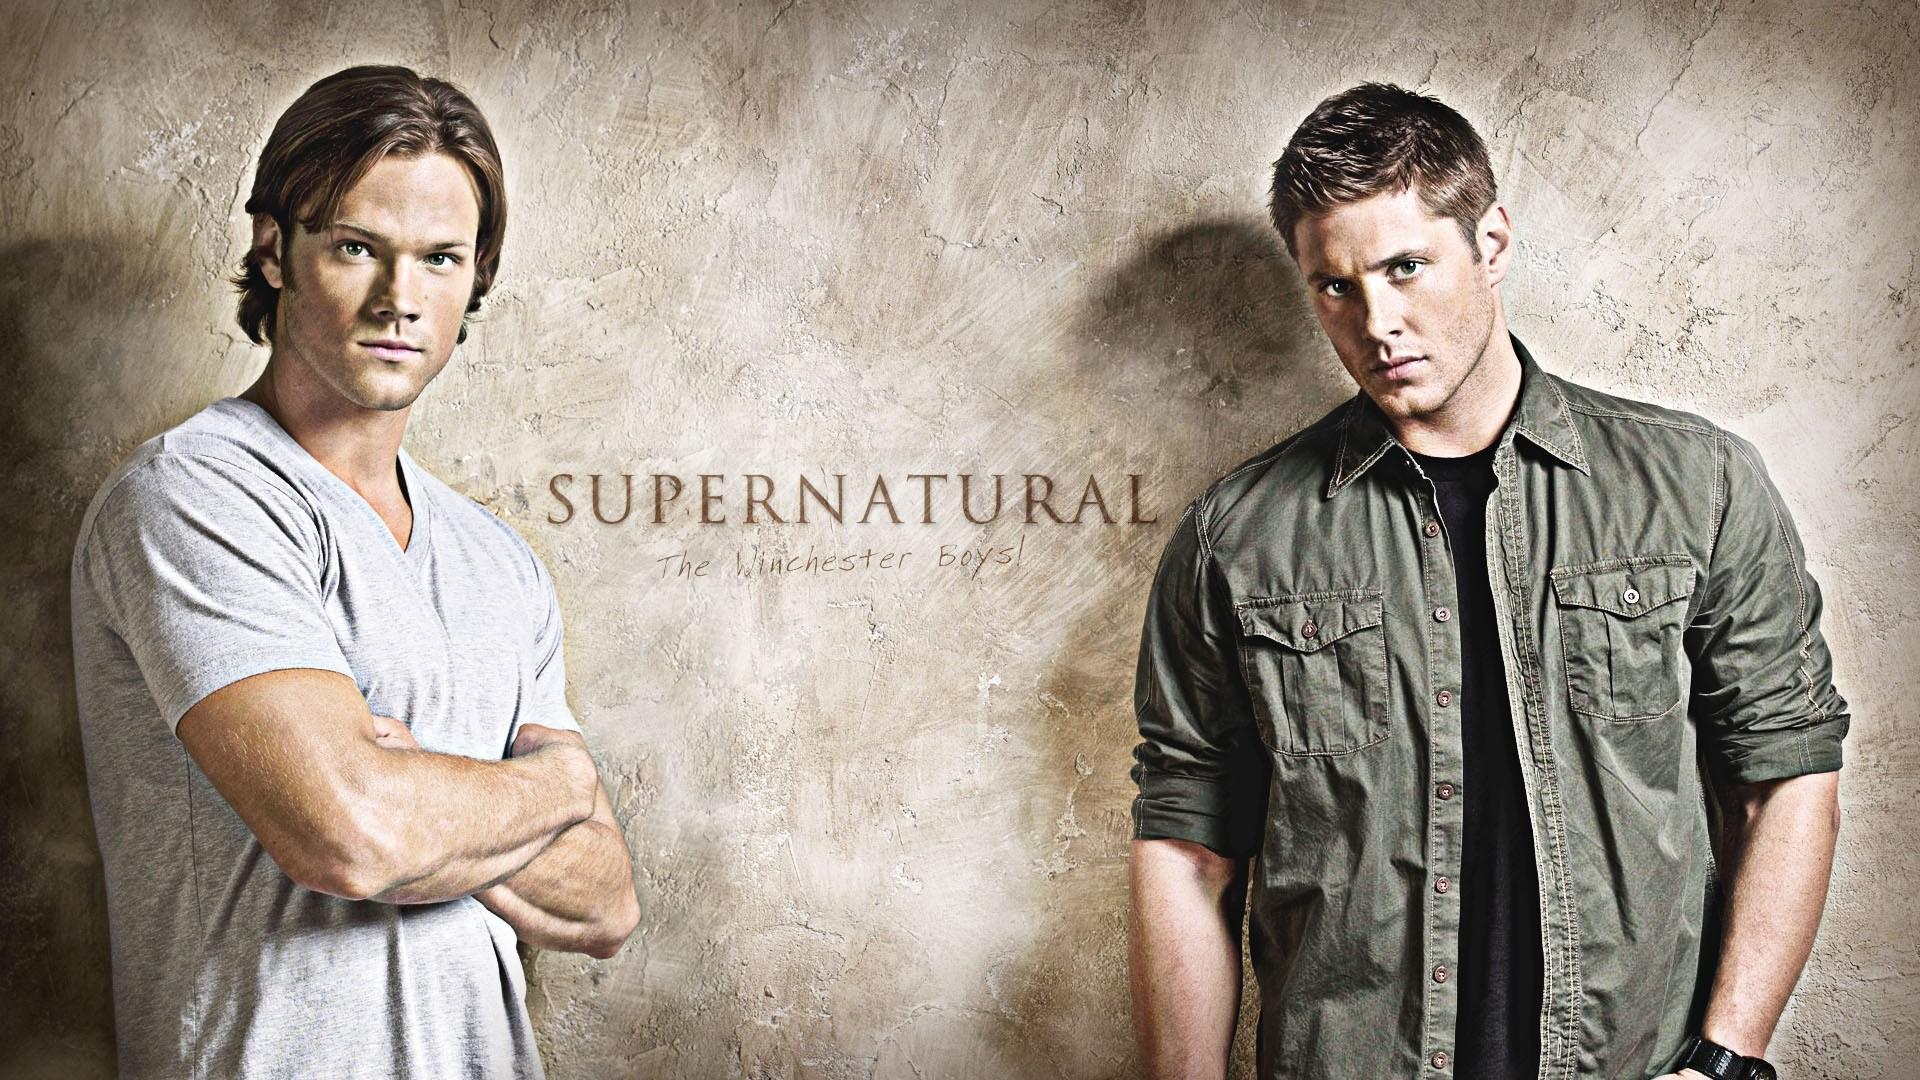 Wallpaper Supernatural, Actors, Jared padalecki, Jensen ackles, Sam  winchester, Dean winchester